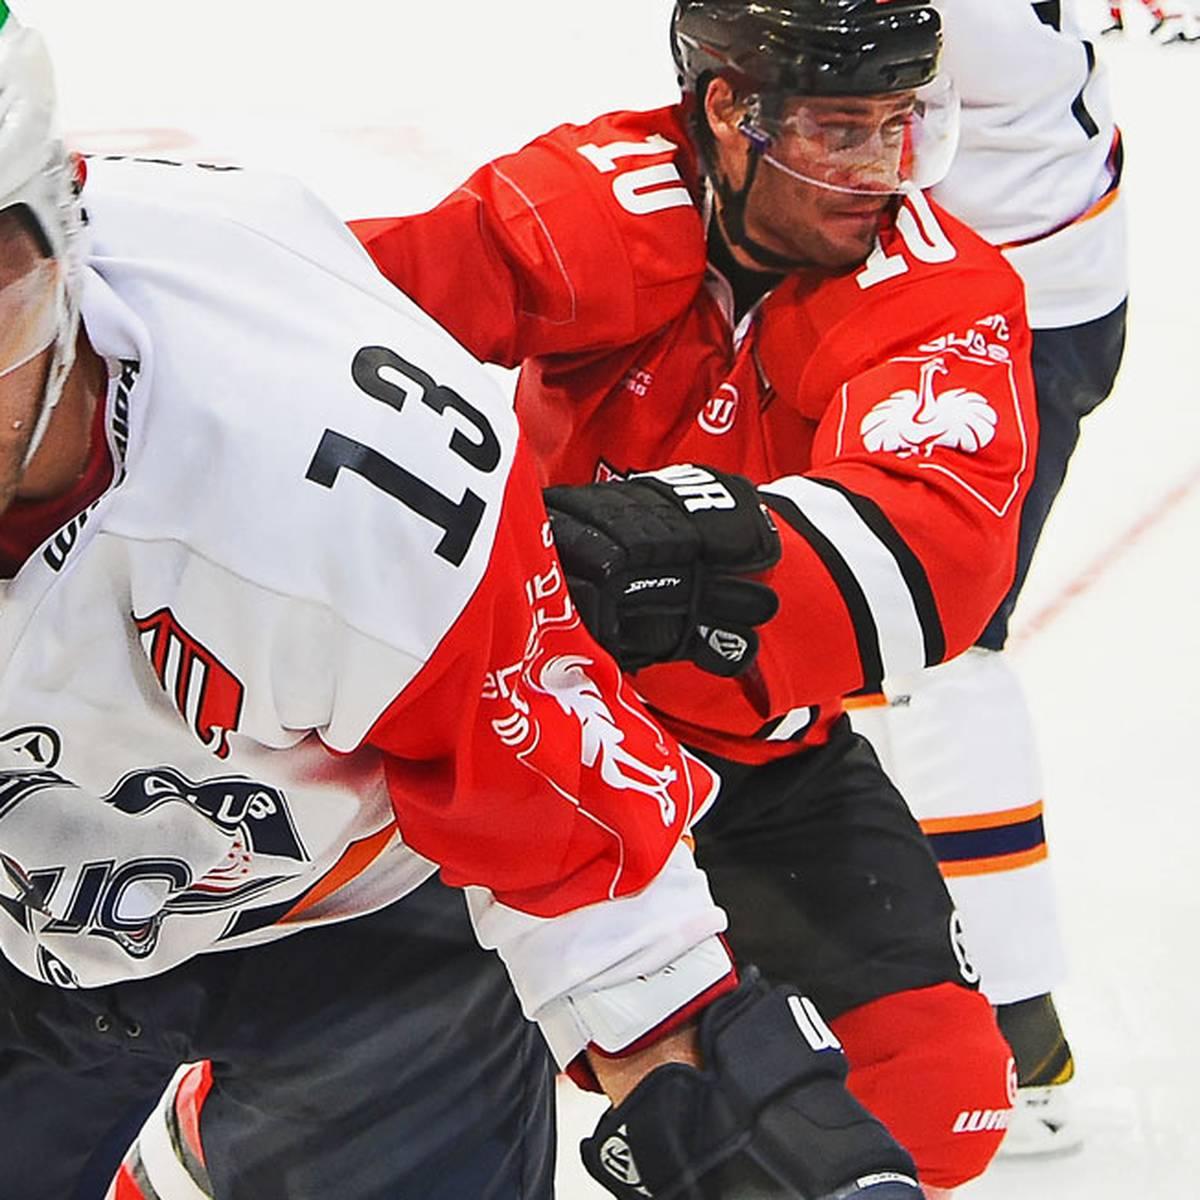 Neue Ära Champions Hockey League